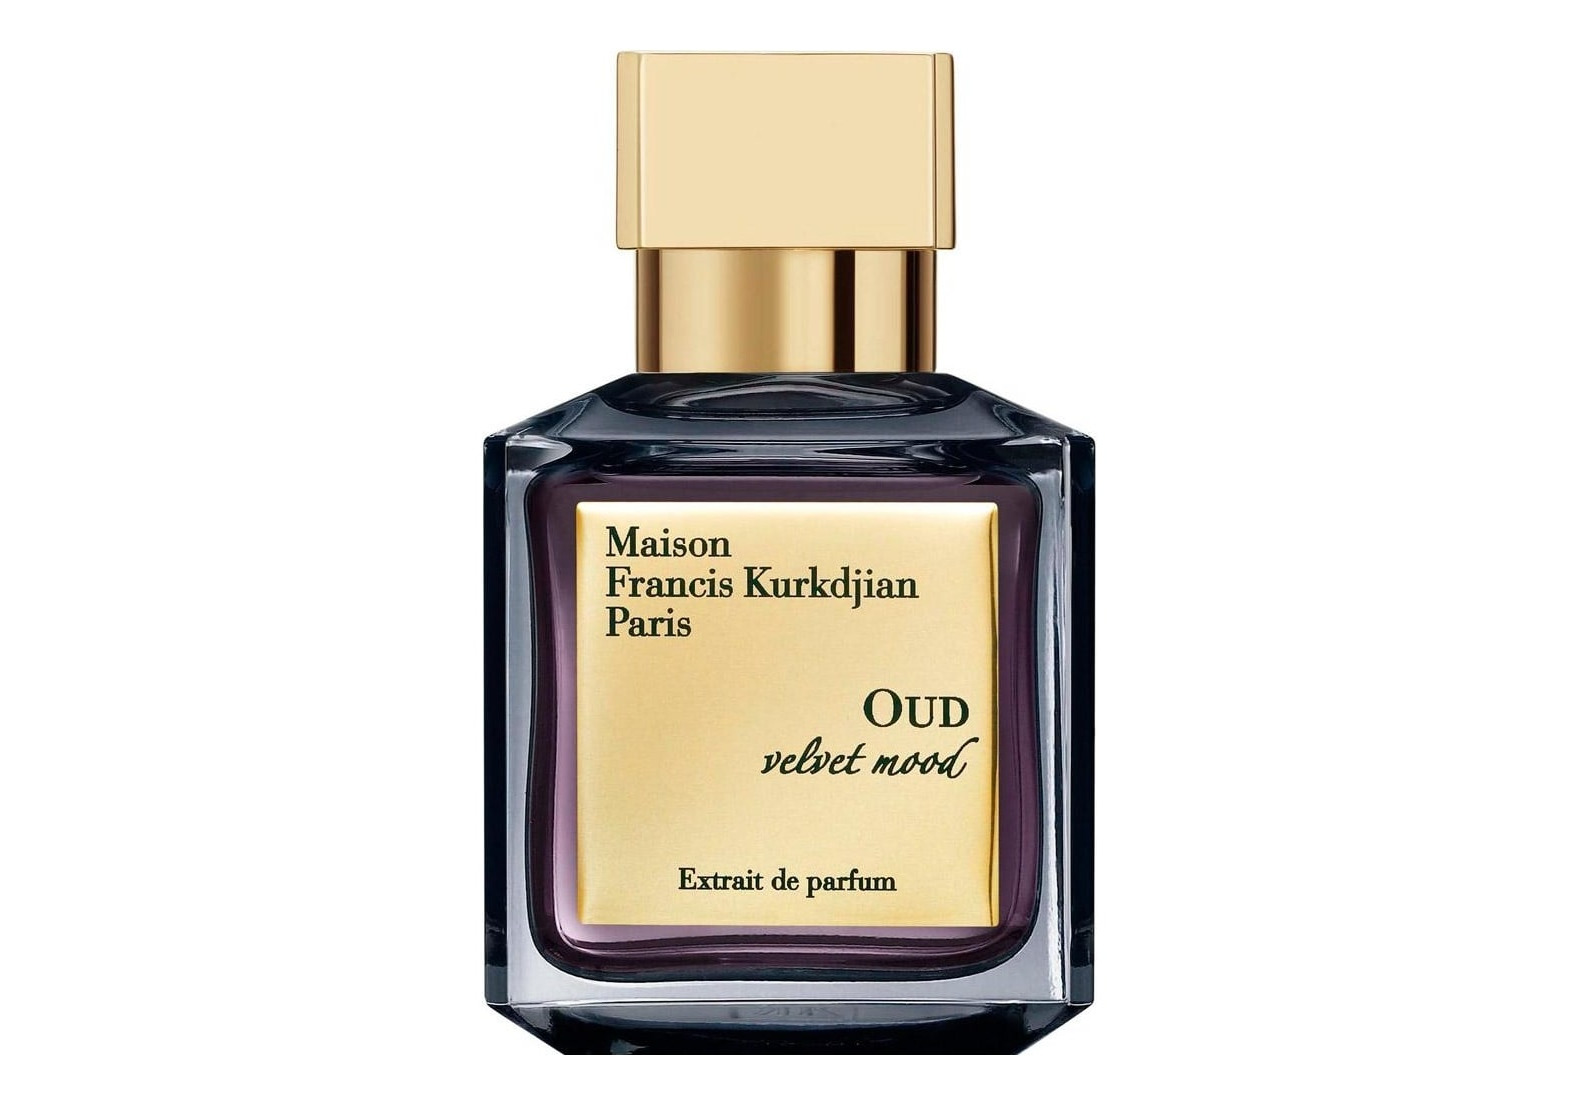 ноты уда в парфюмерии